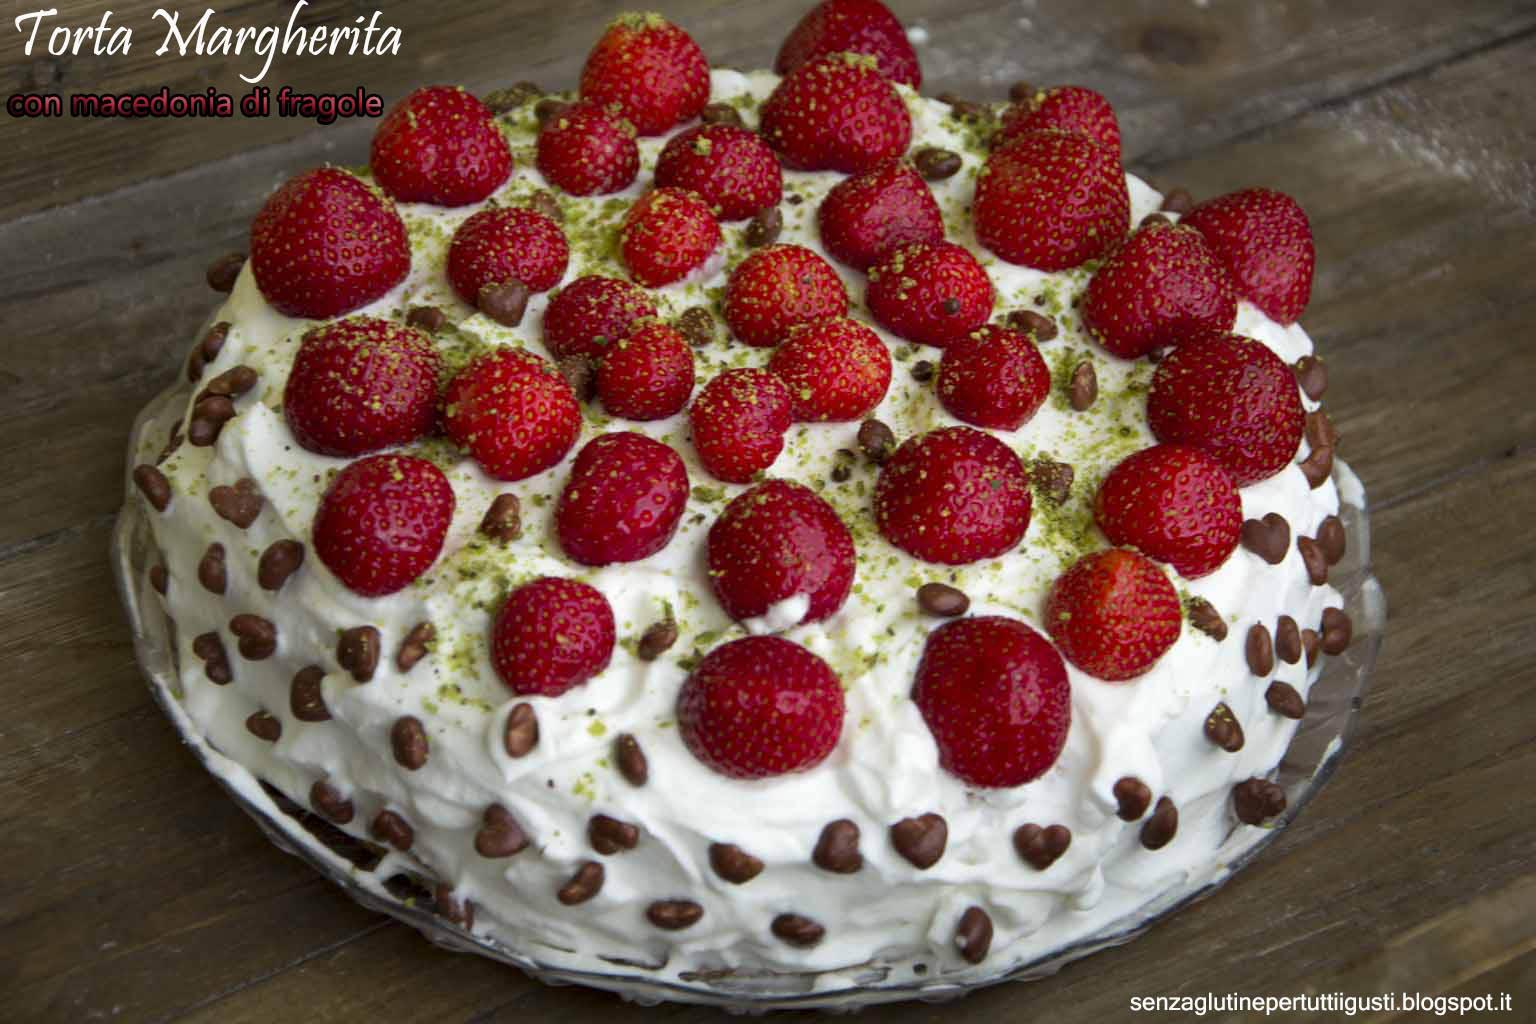 torta_margherita_con_macedonia_di_fragole_e_panna1.jpg